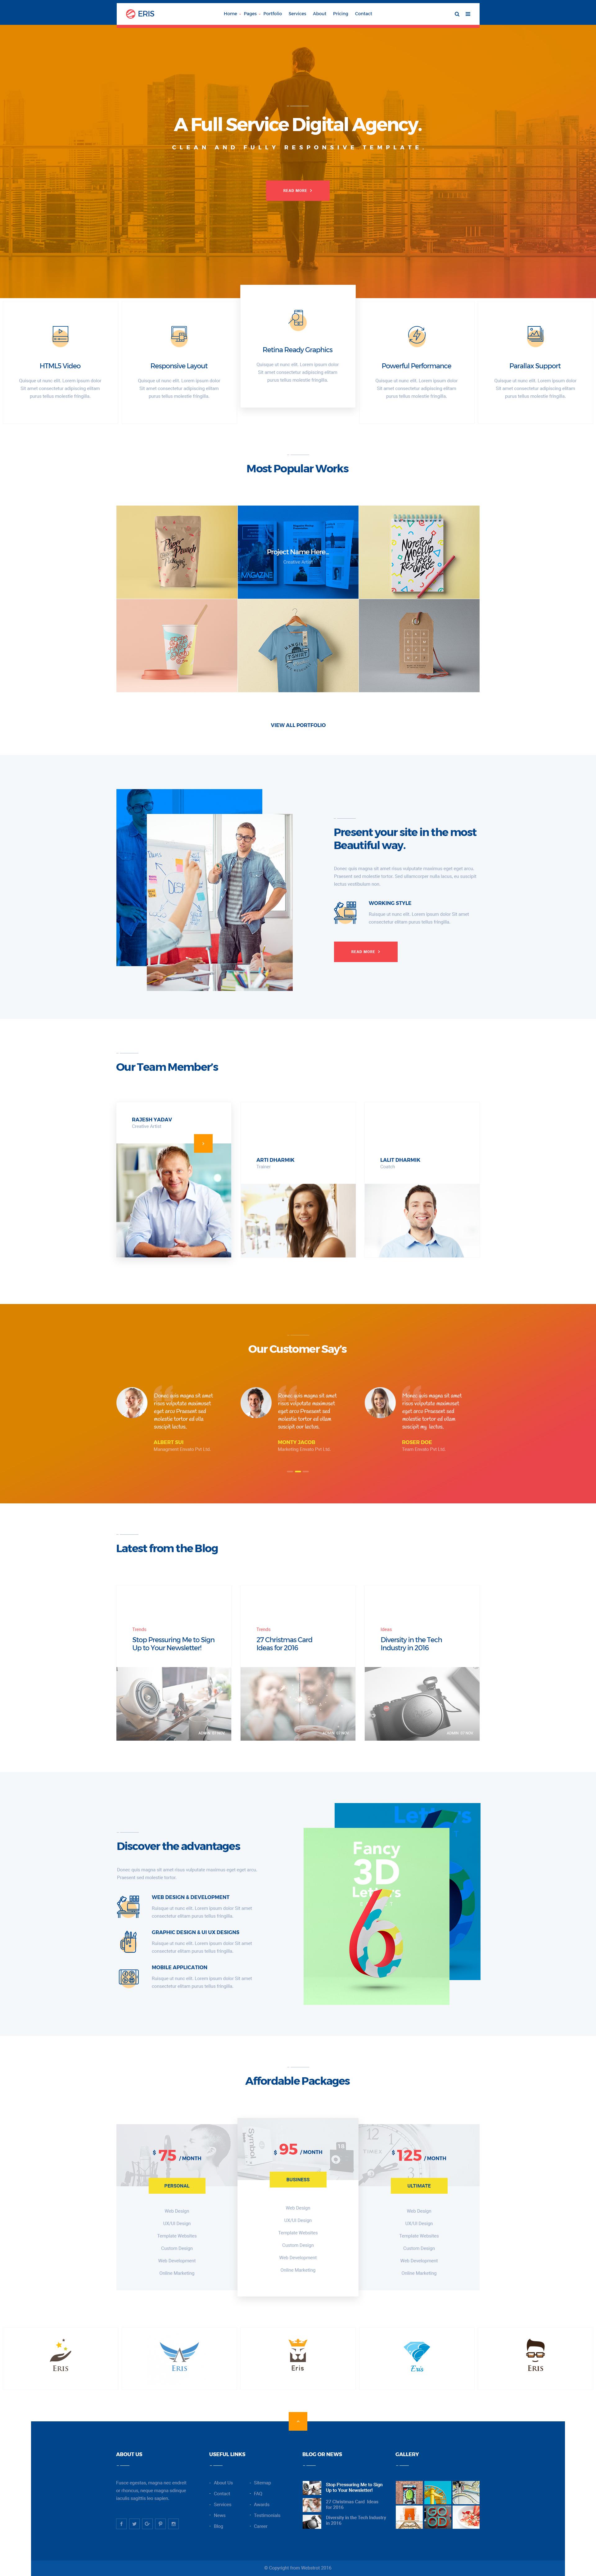 ERIS -Design Studio Marketing Agency PSD Template